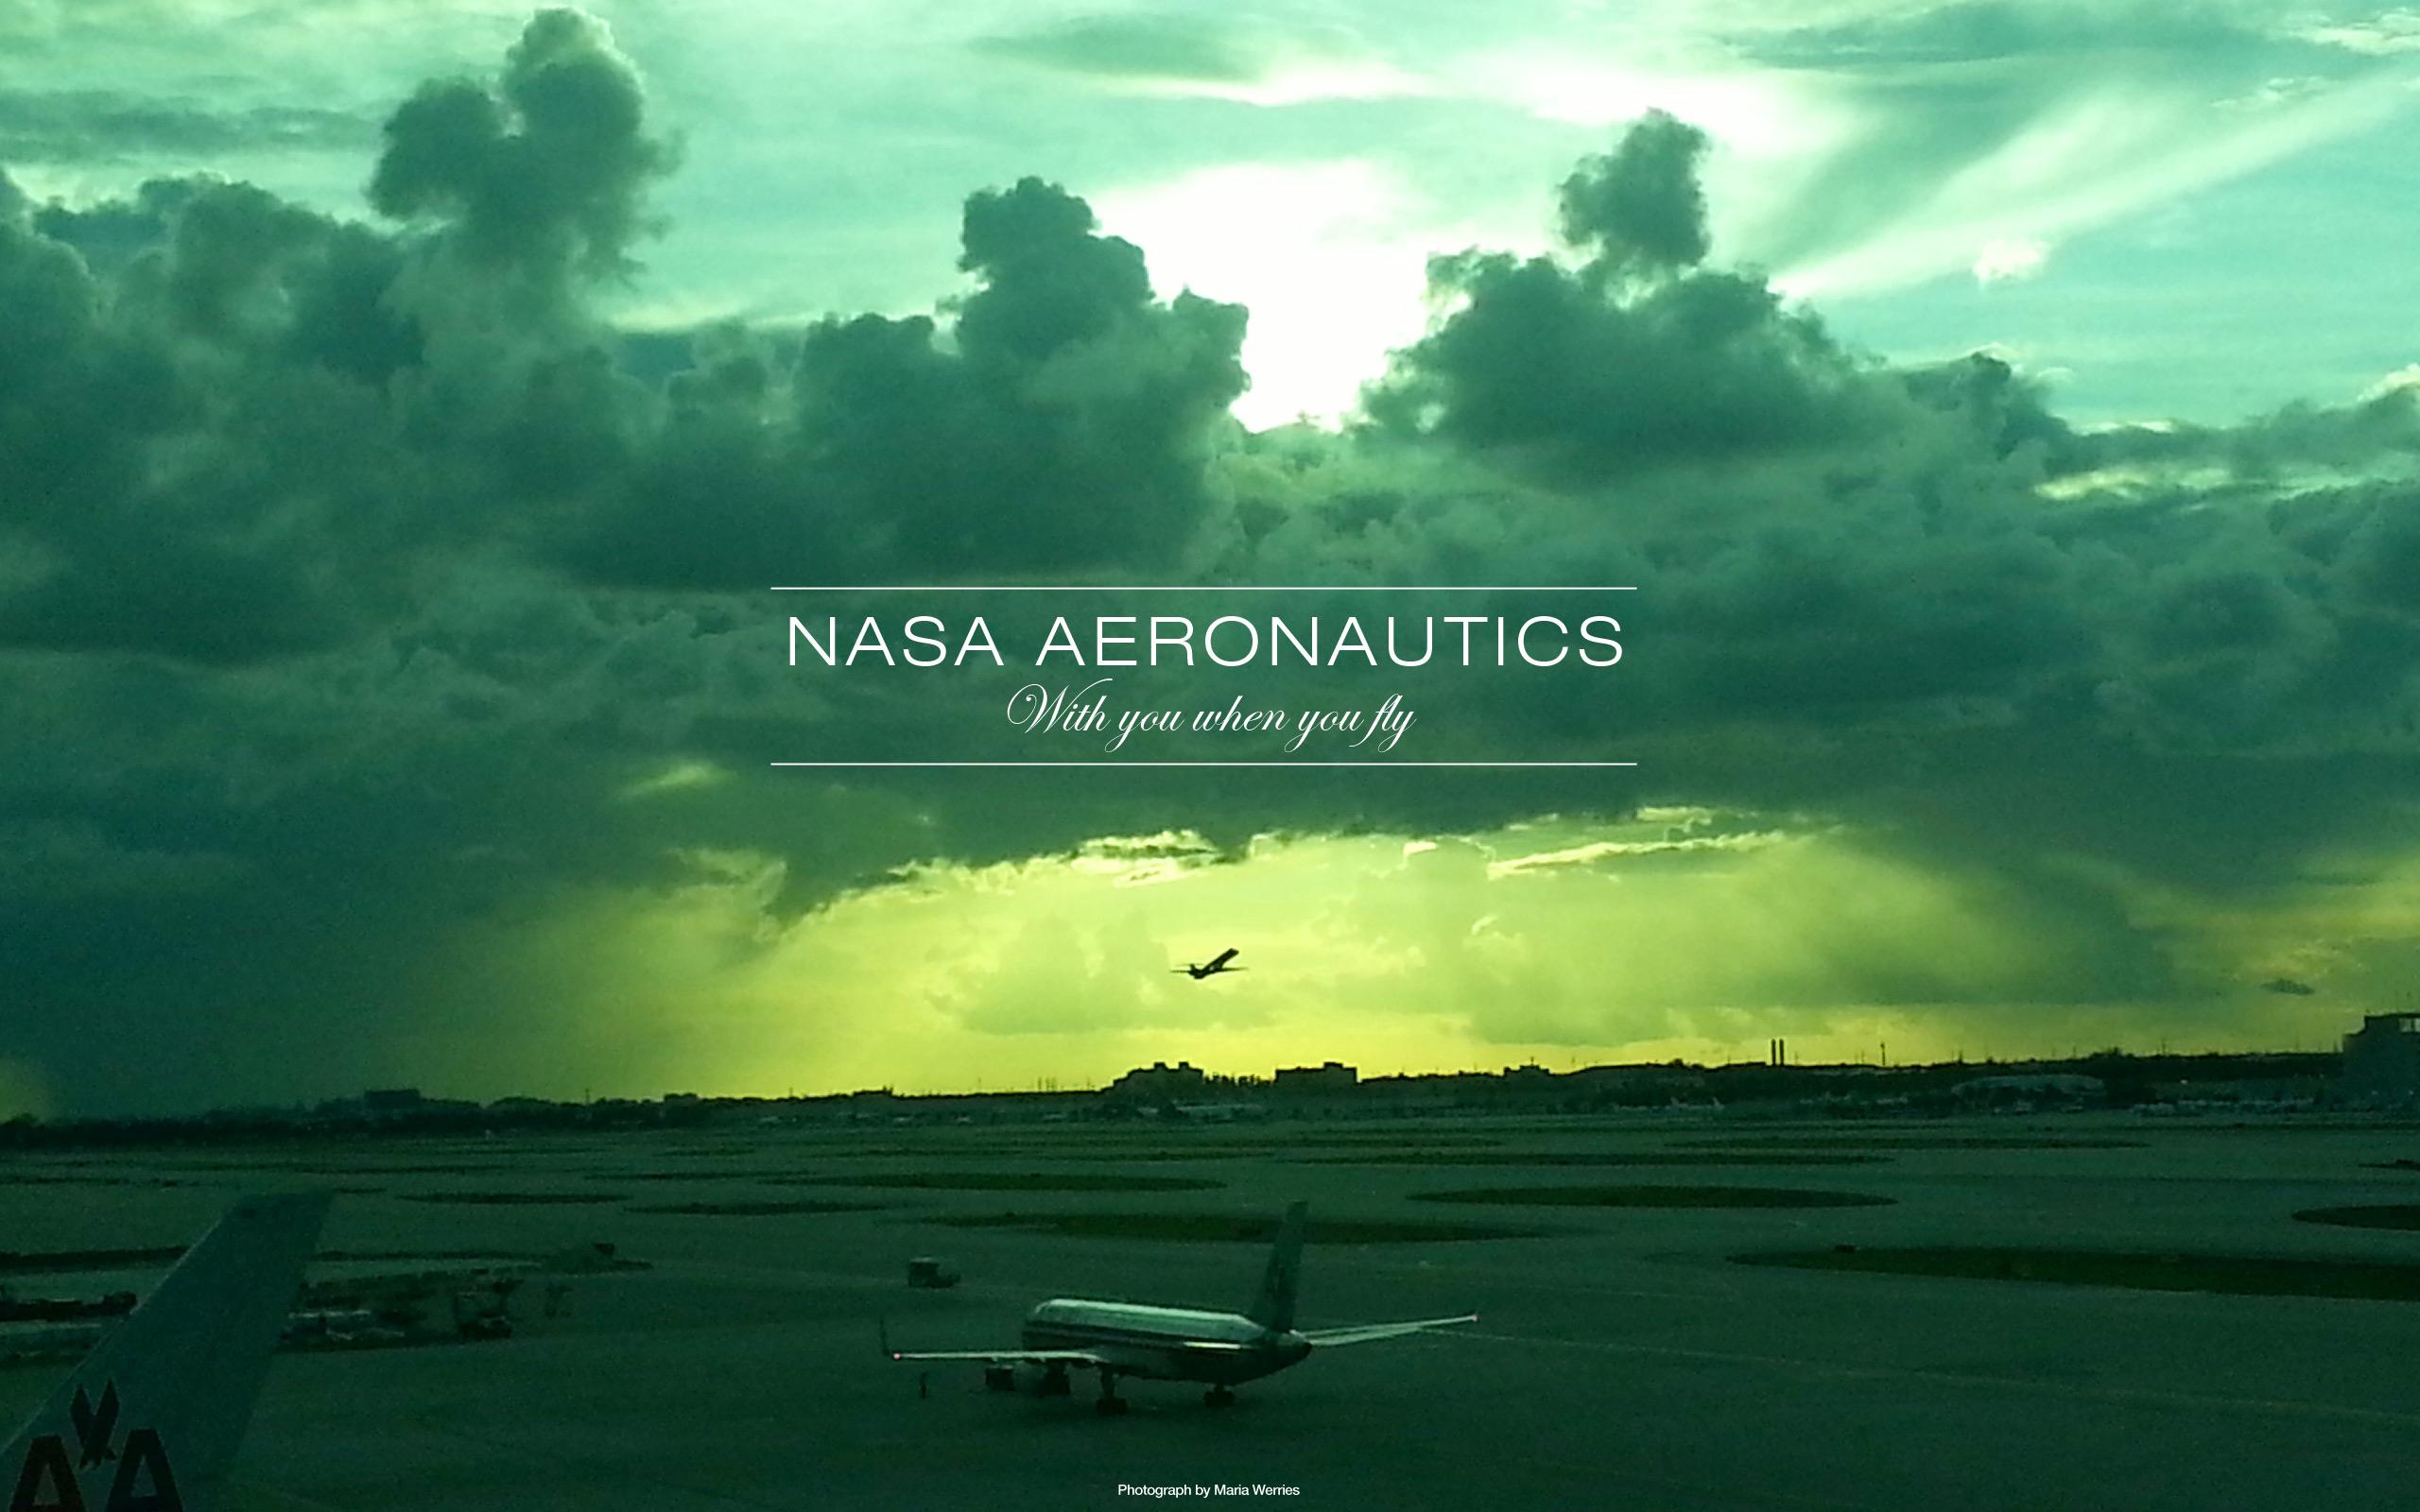 nasa aeronautics wallpapers | nasa